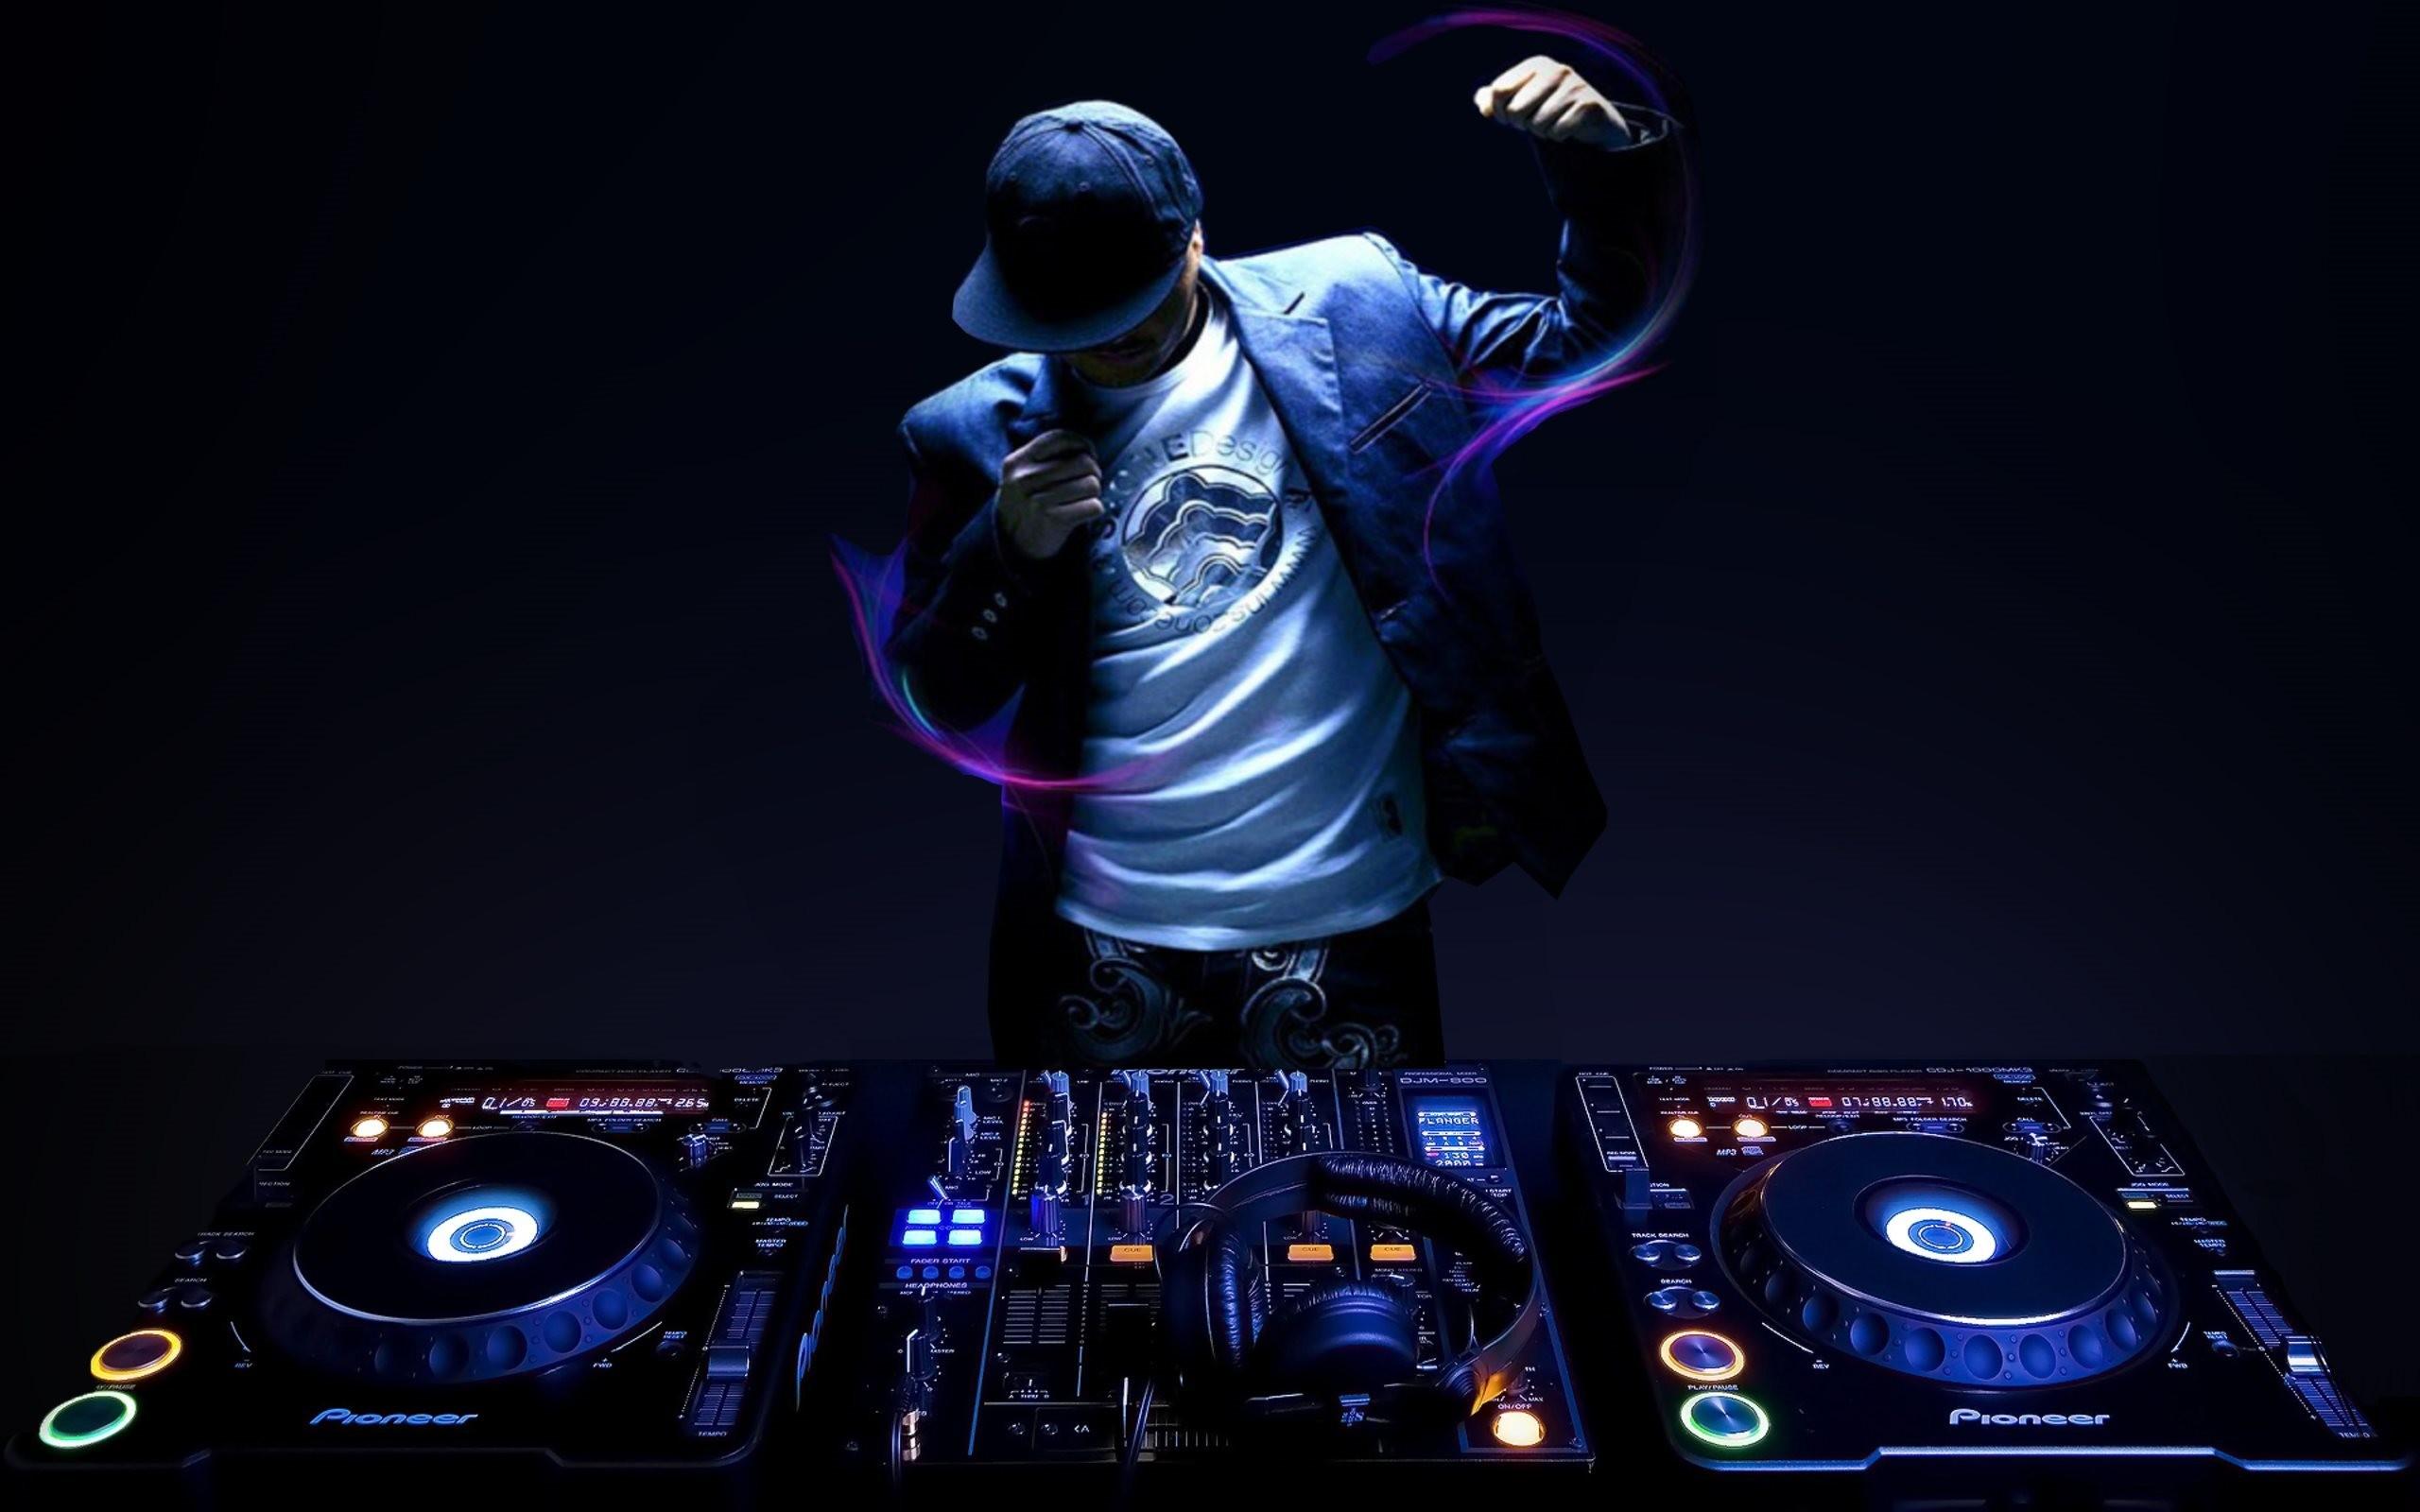 DJ, night club, dj console, concert, musician, DJs